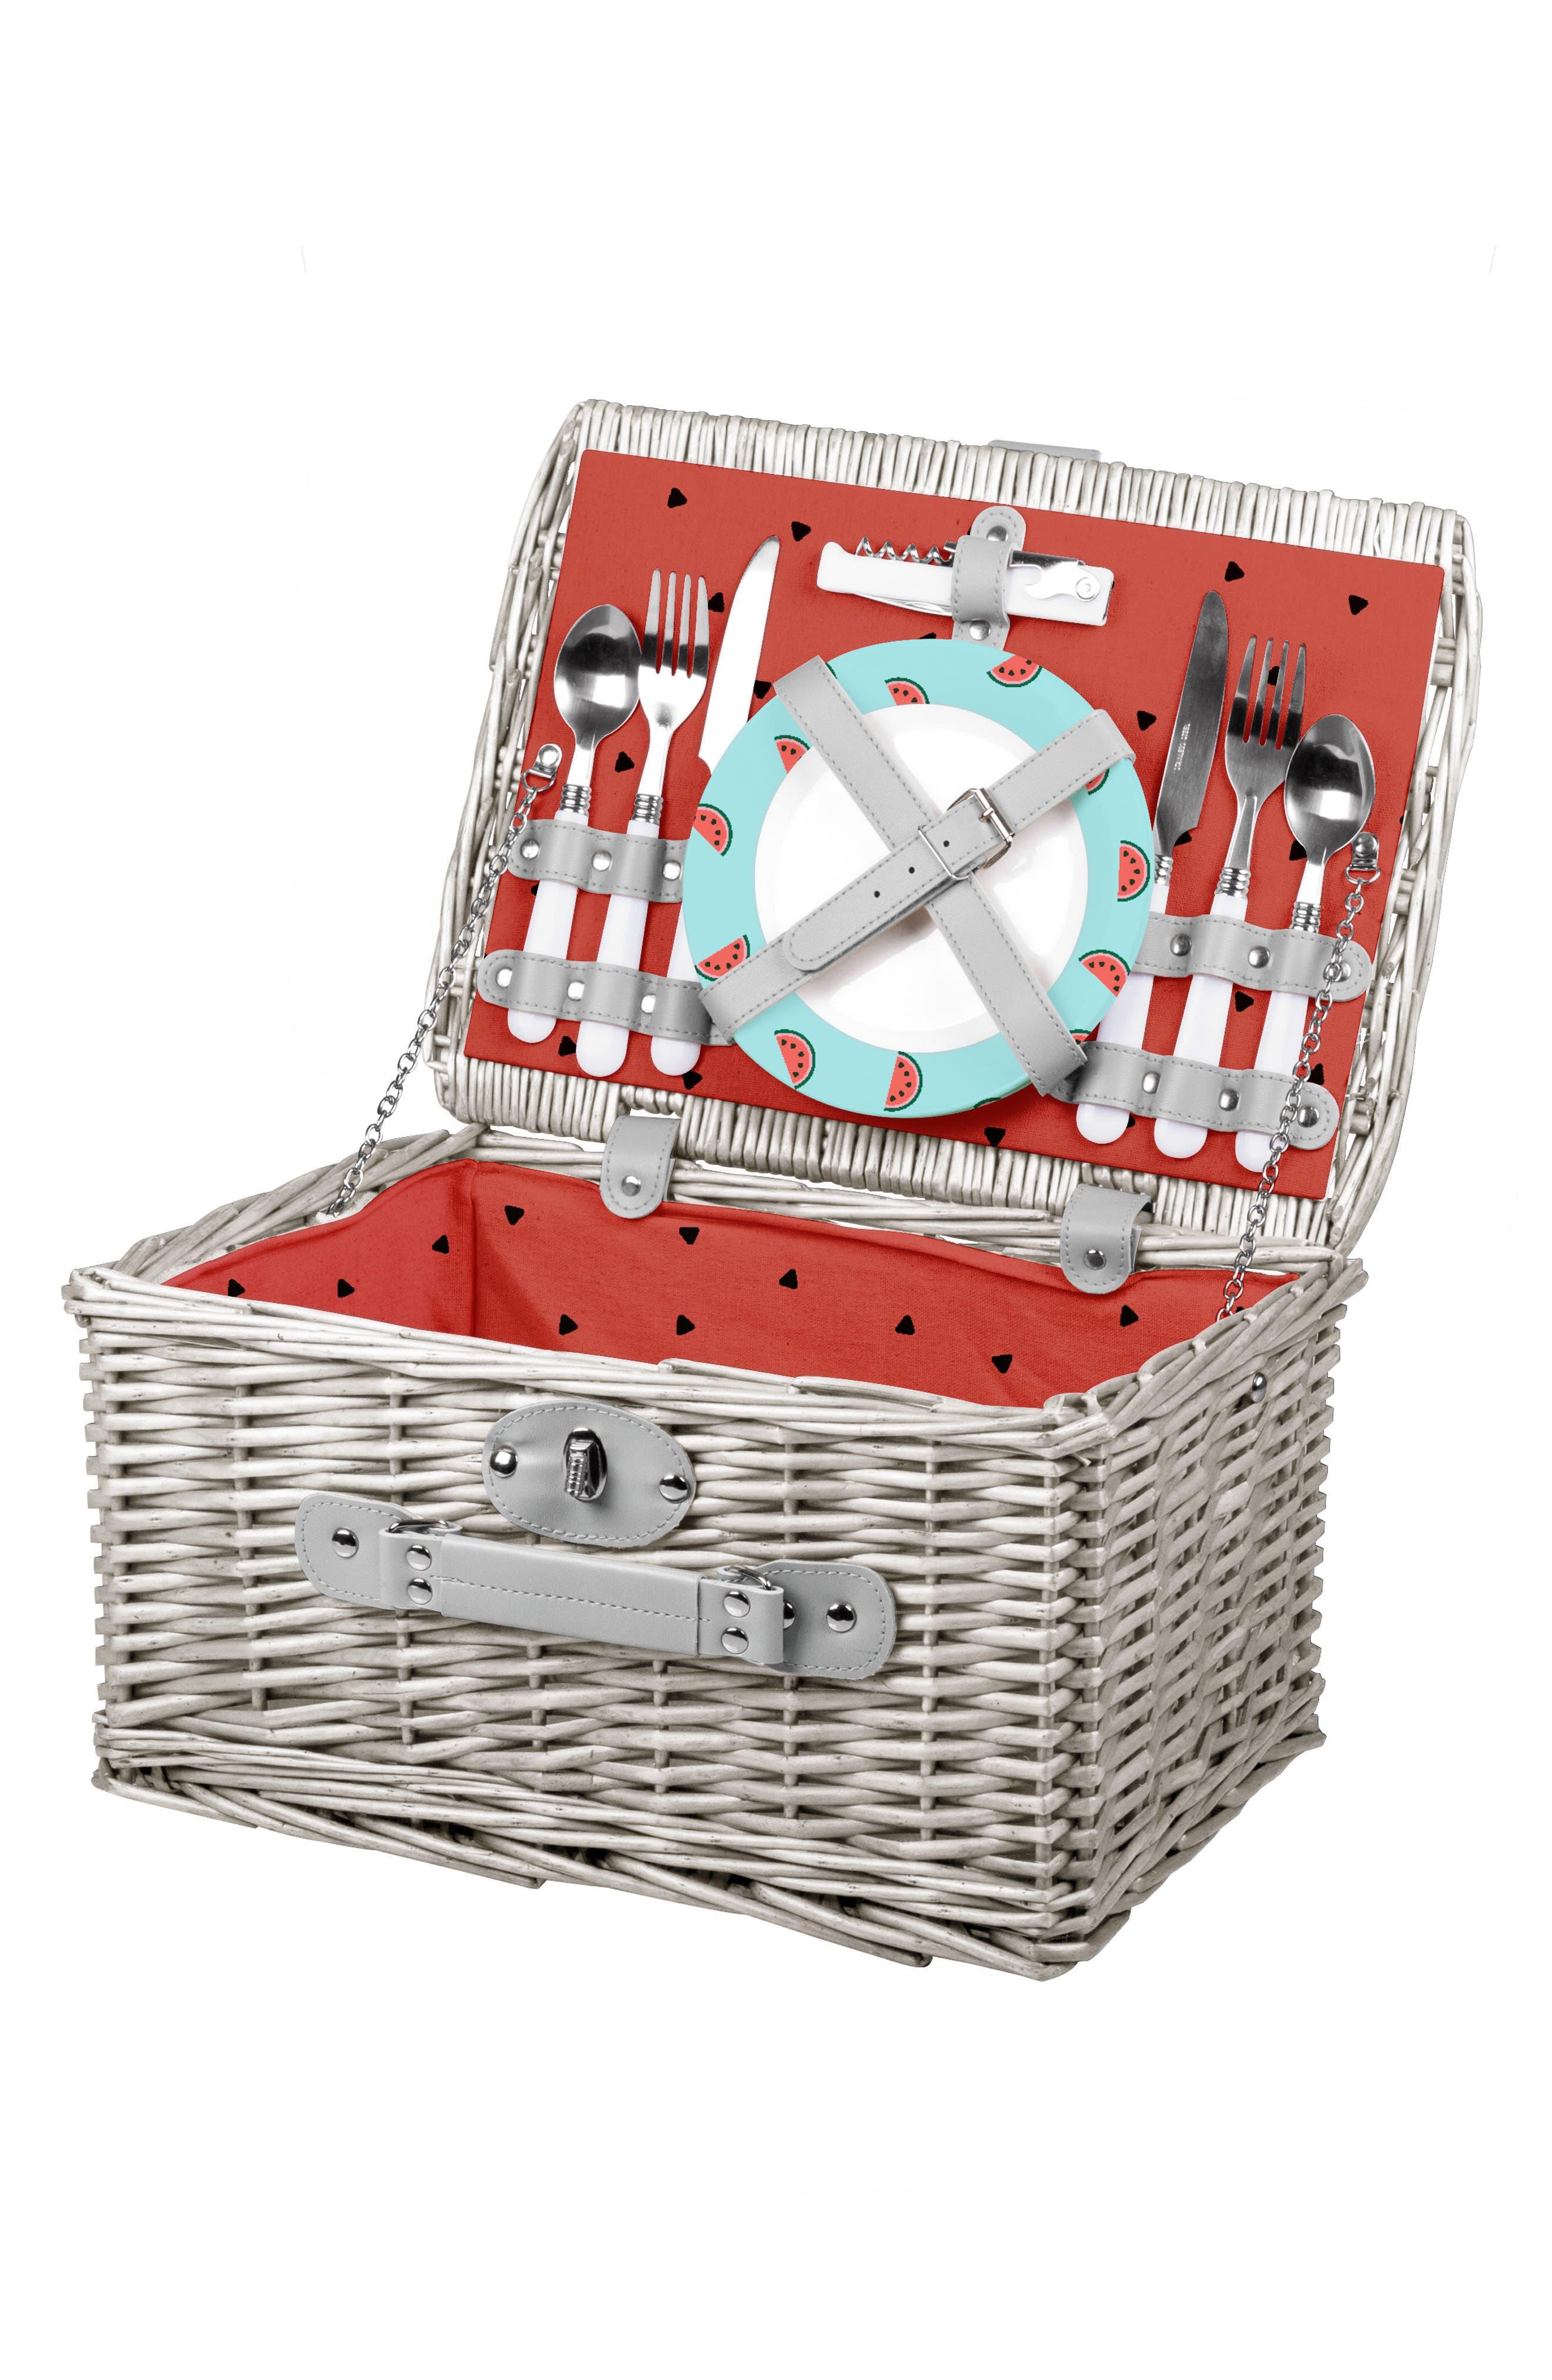 Main Image - Picnic Time Catalina Wicker Picnic Basket